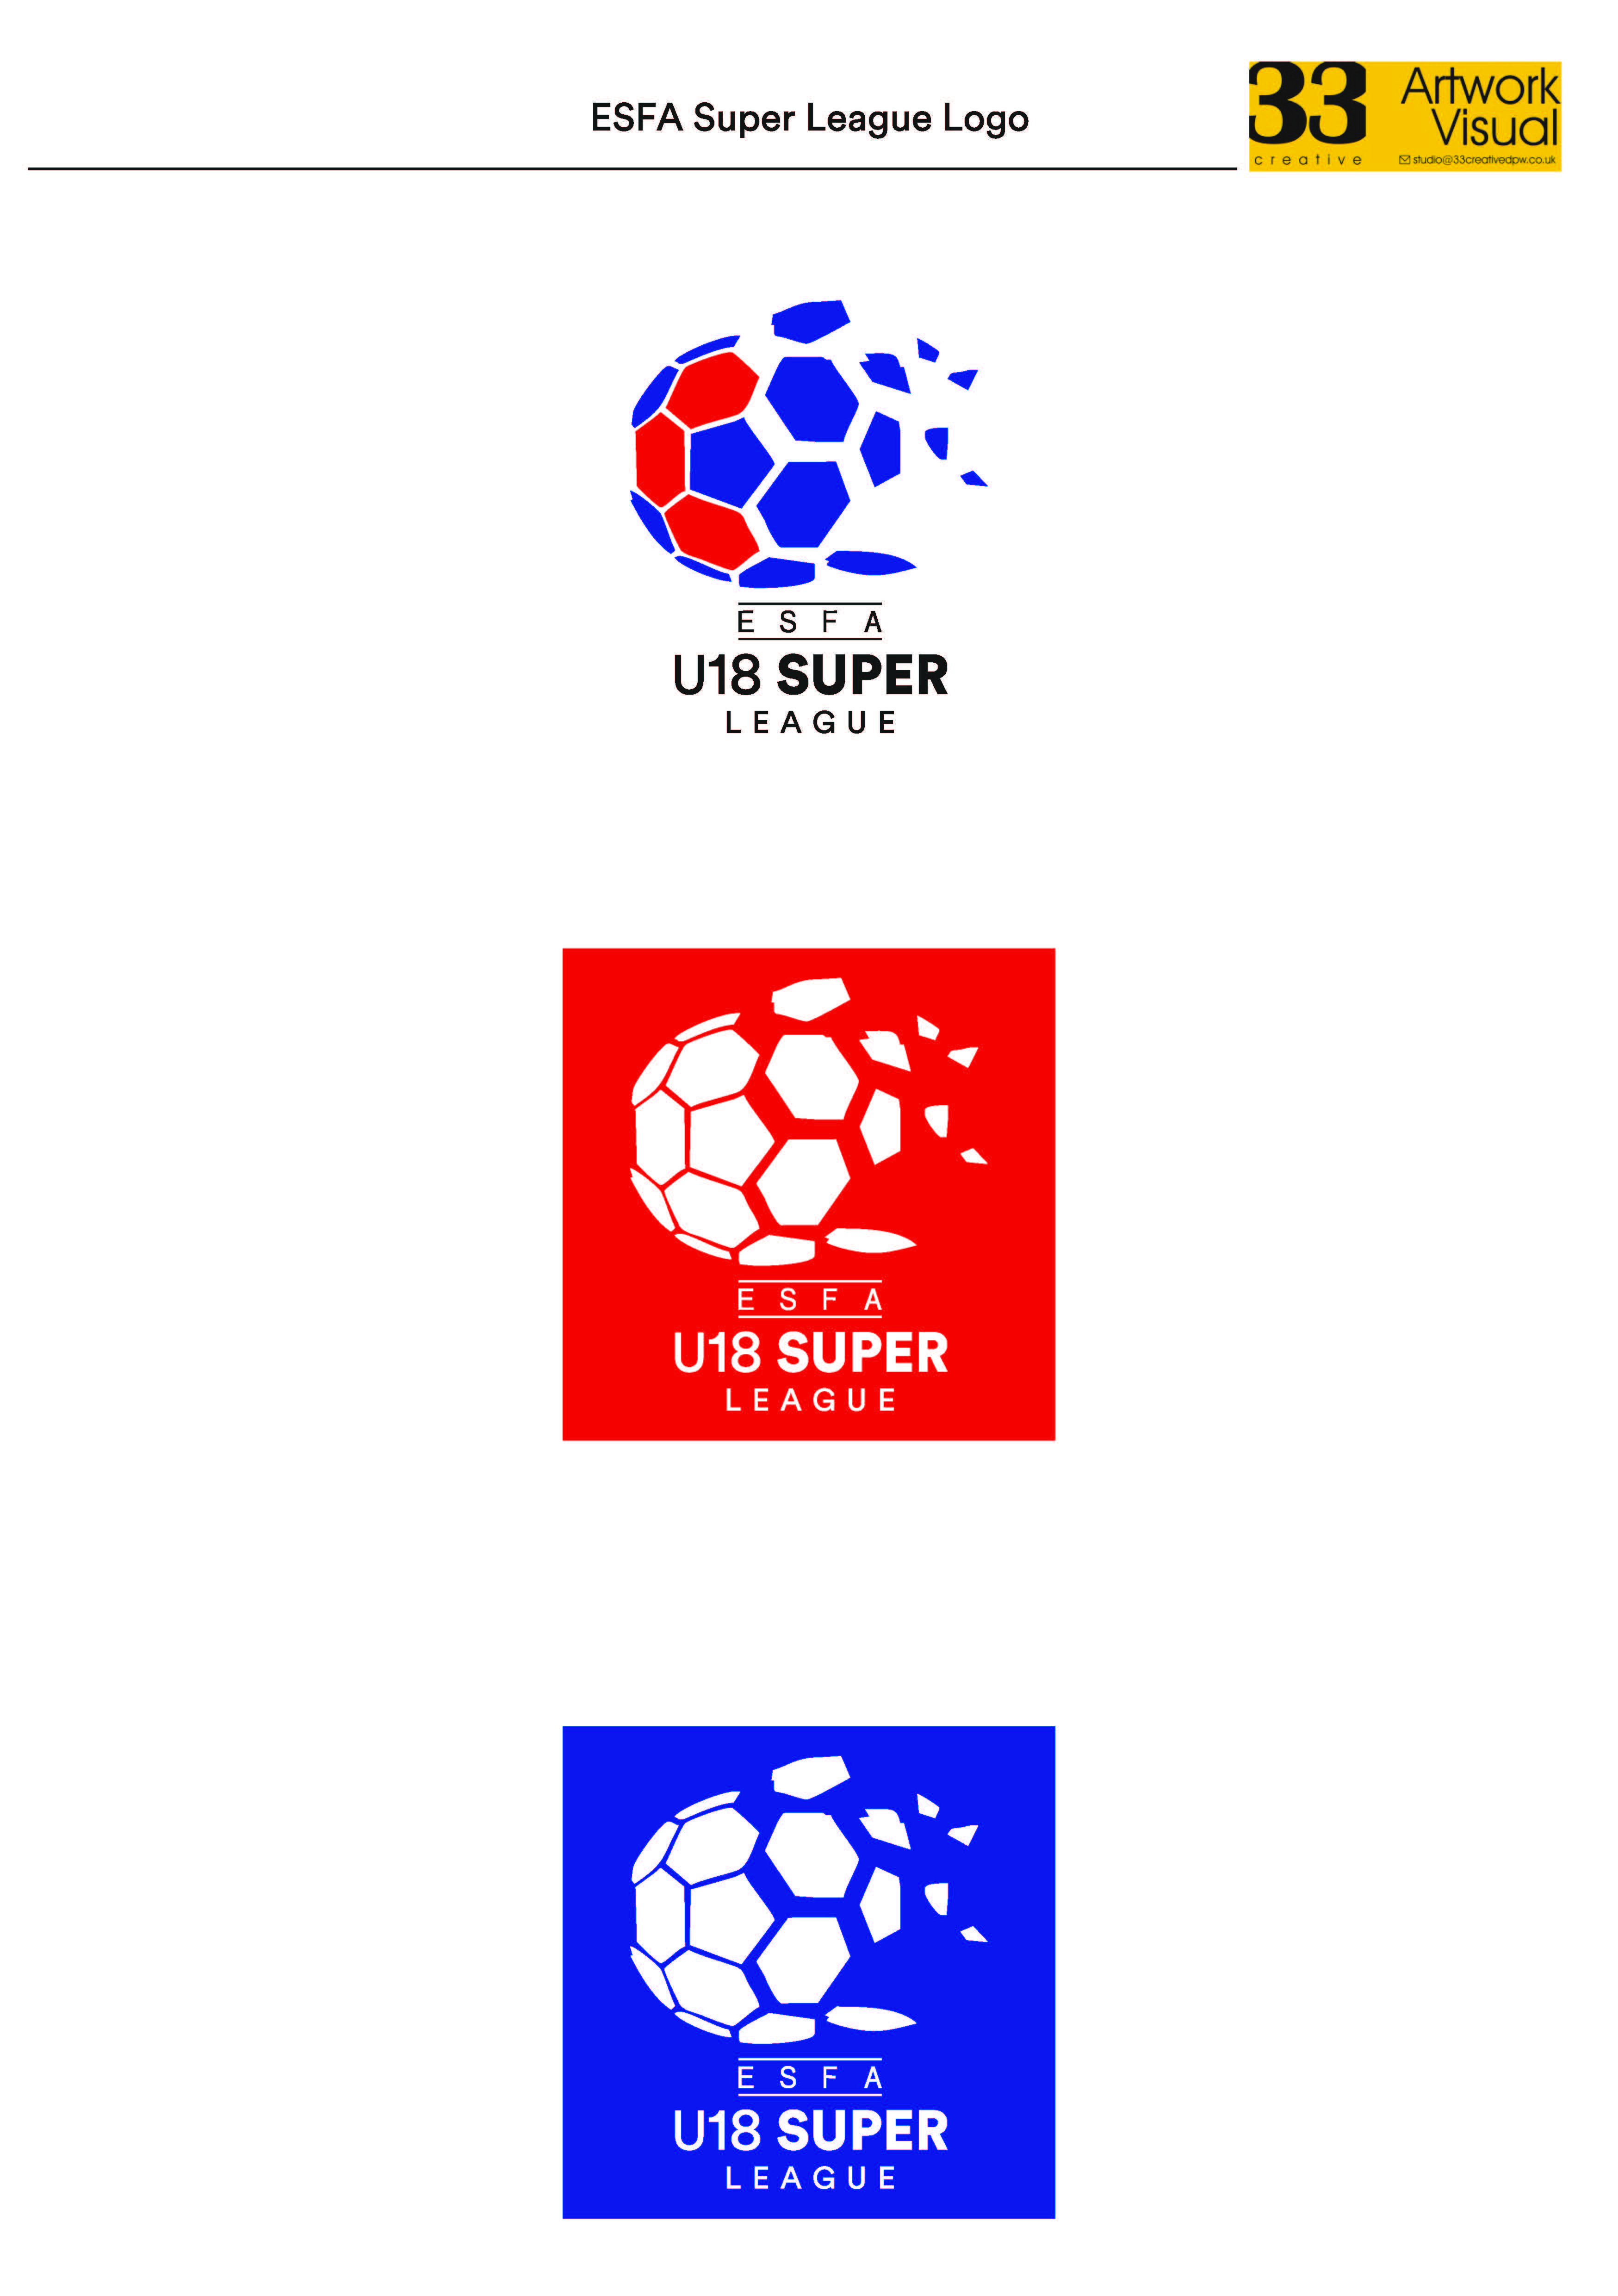 ESFA Super League brand_Page_2